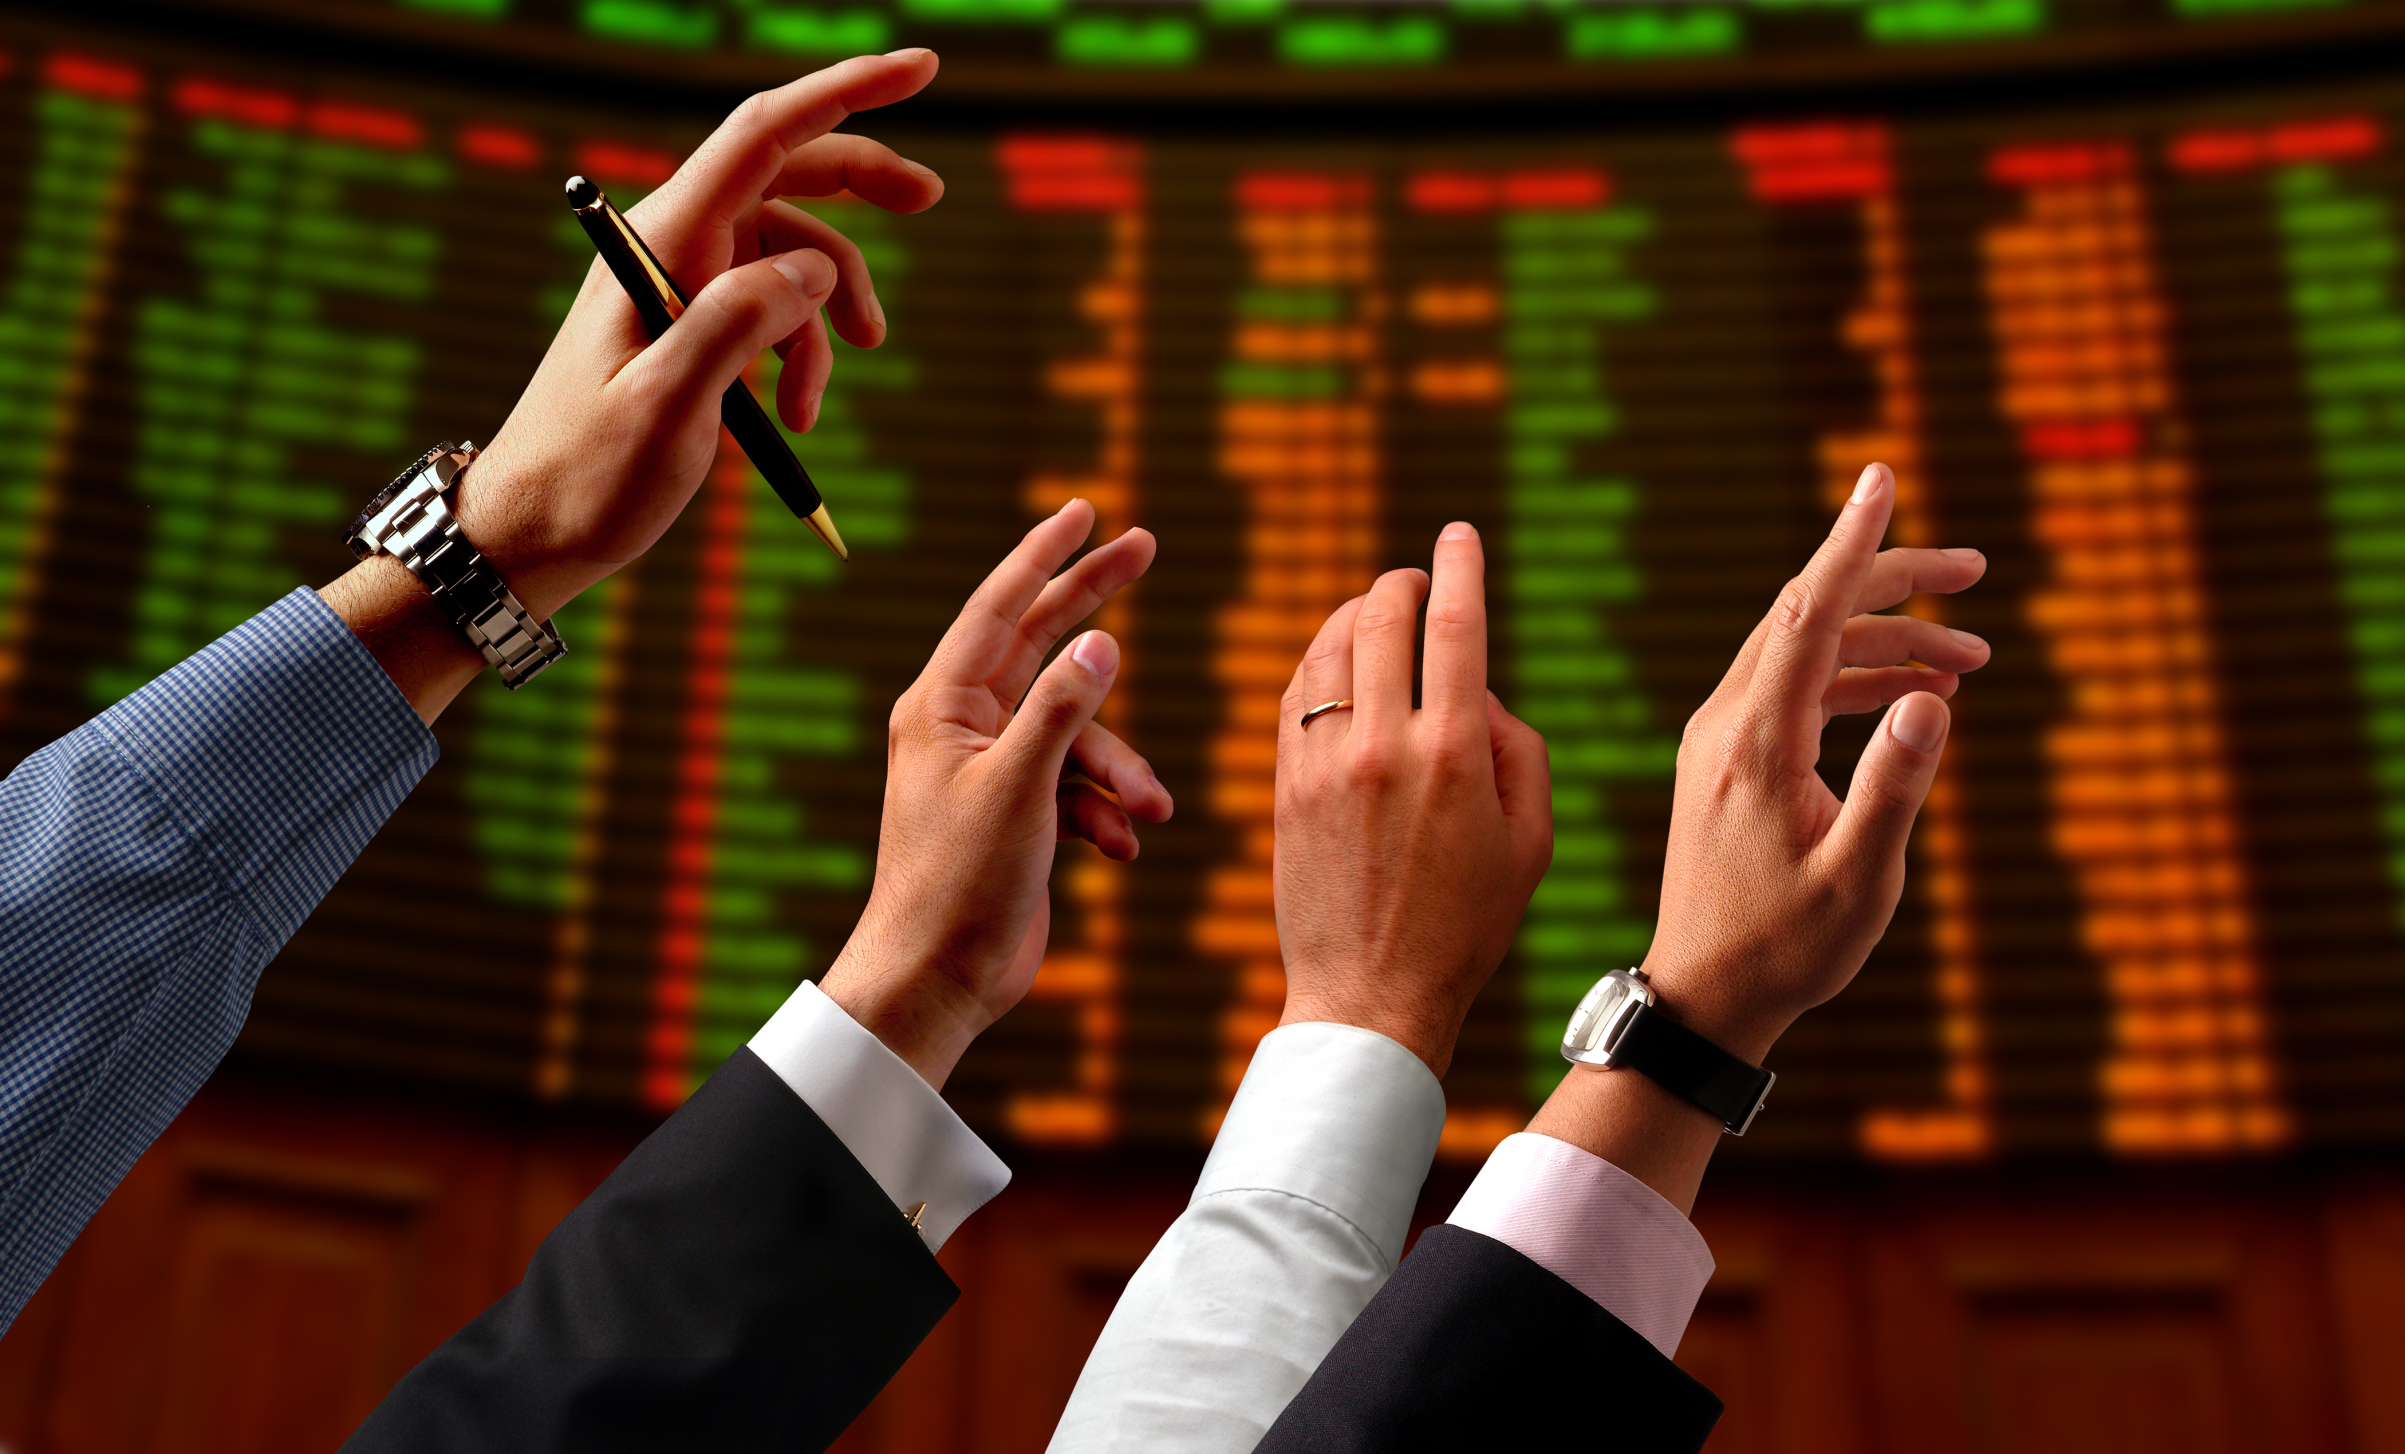 sto金融投资市场 美国 股票市场 历史新高